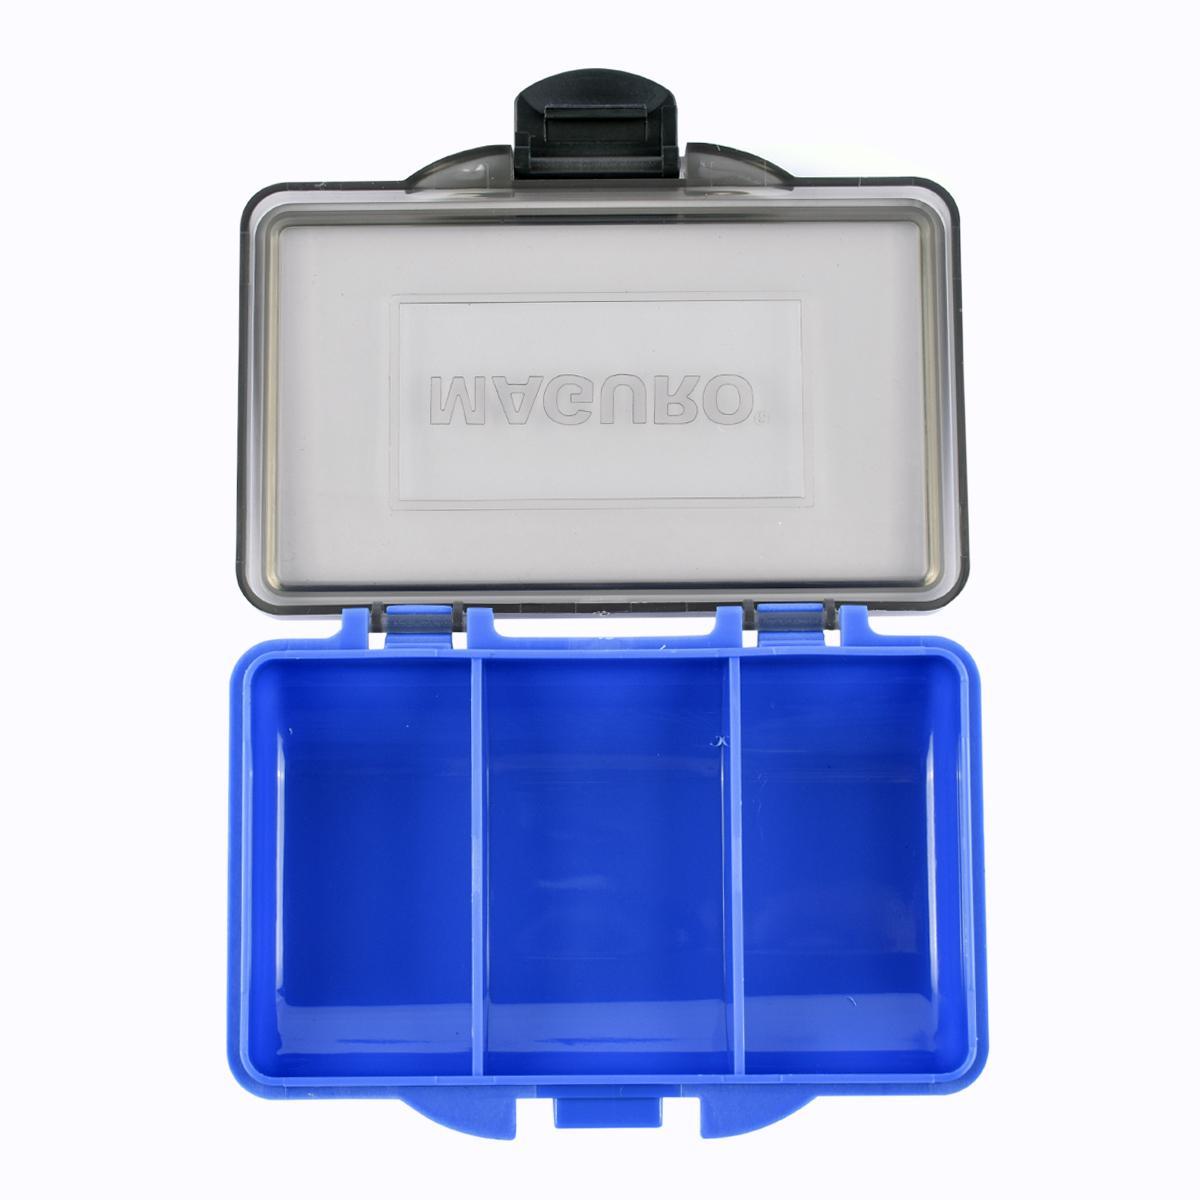 Kotak Pancing Maguro Carp Small Box 3 Compart Warna Biru